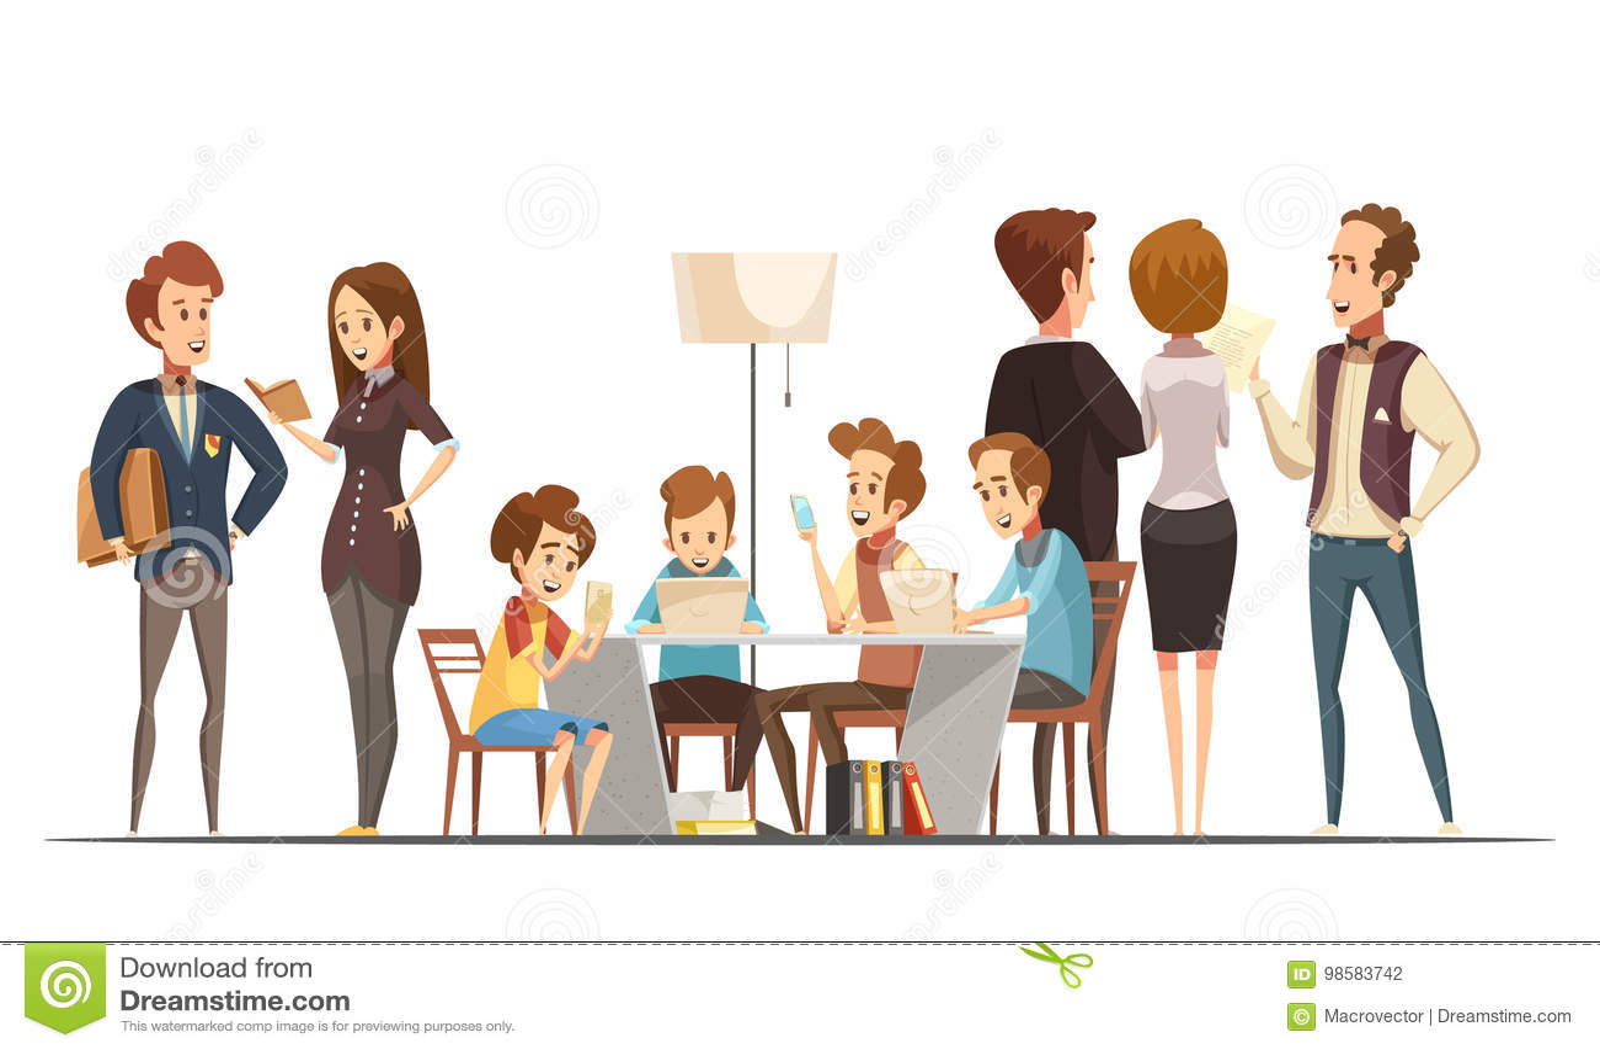 Karikatur mit Teenagern